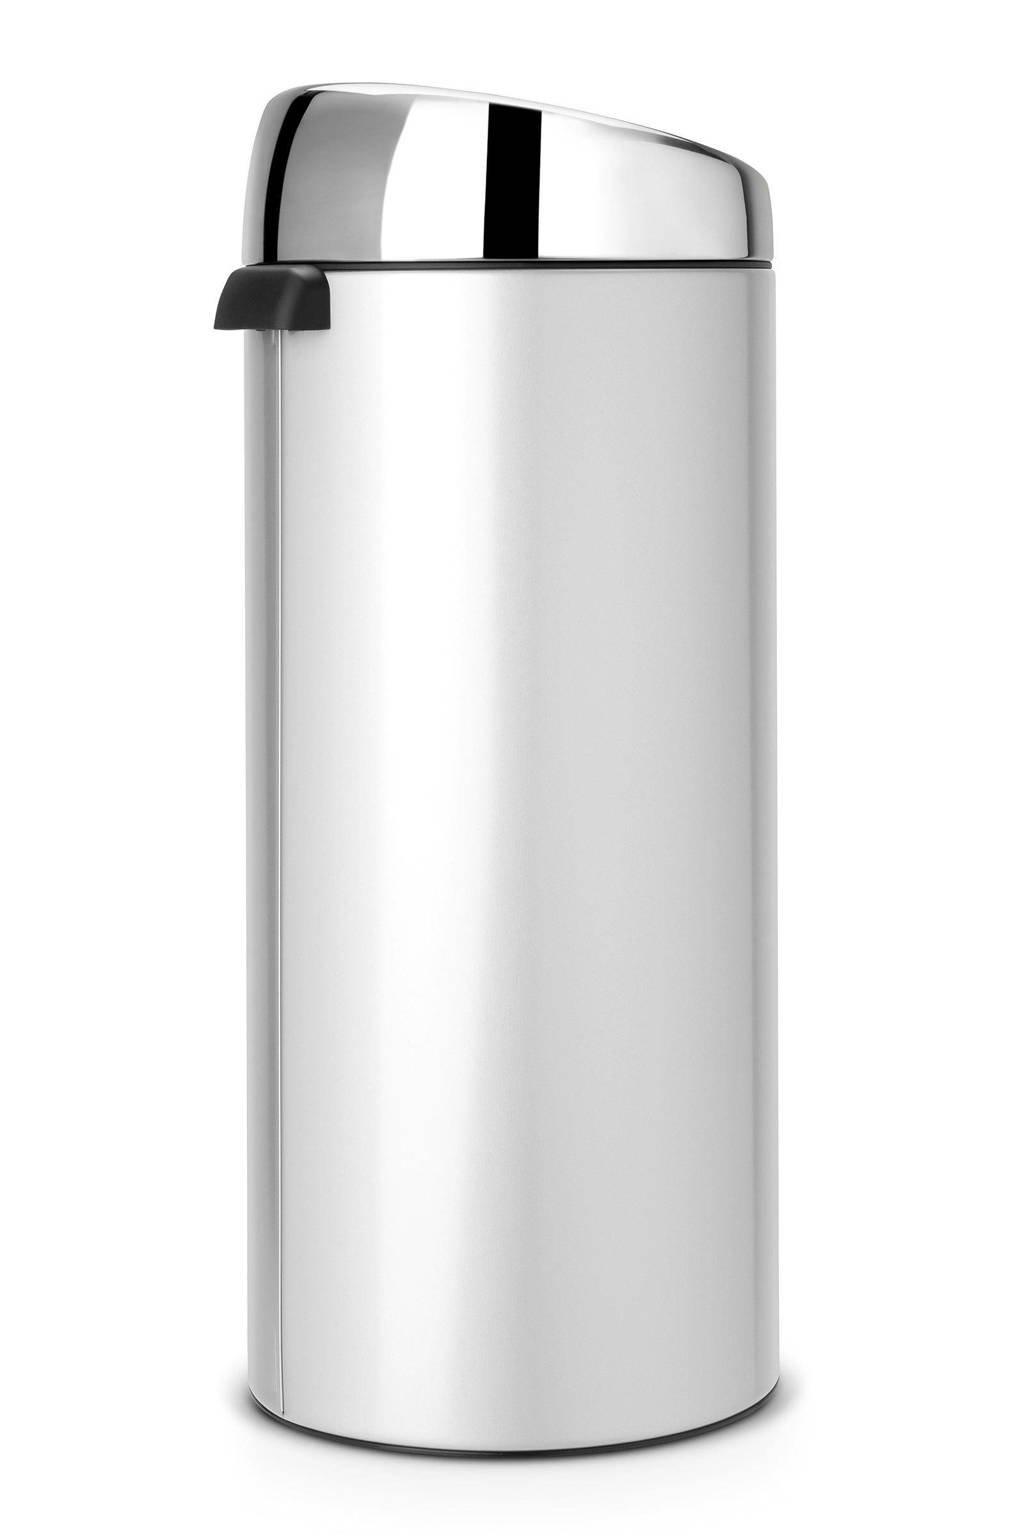 Brabantia 30 Liter Touch Bin.Brabantia Touch Bin 30 Liter Prullenbak Wehkamp